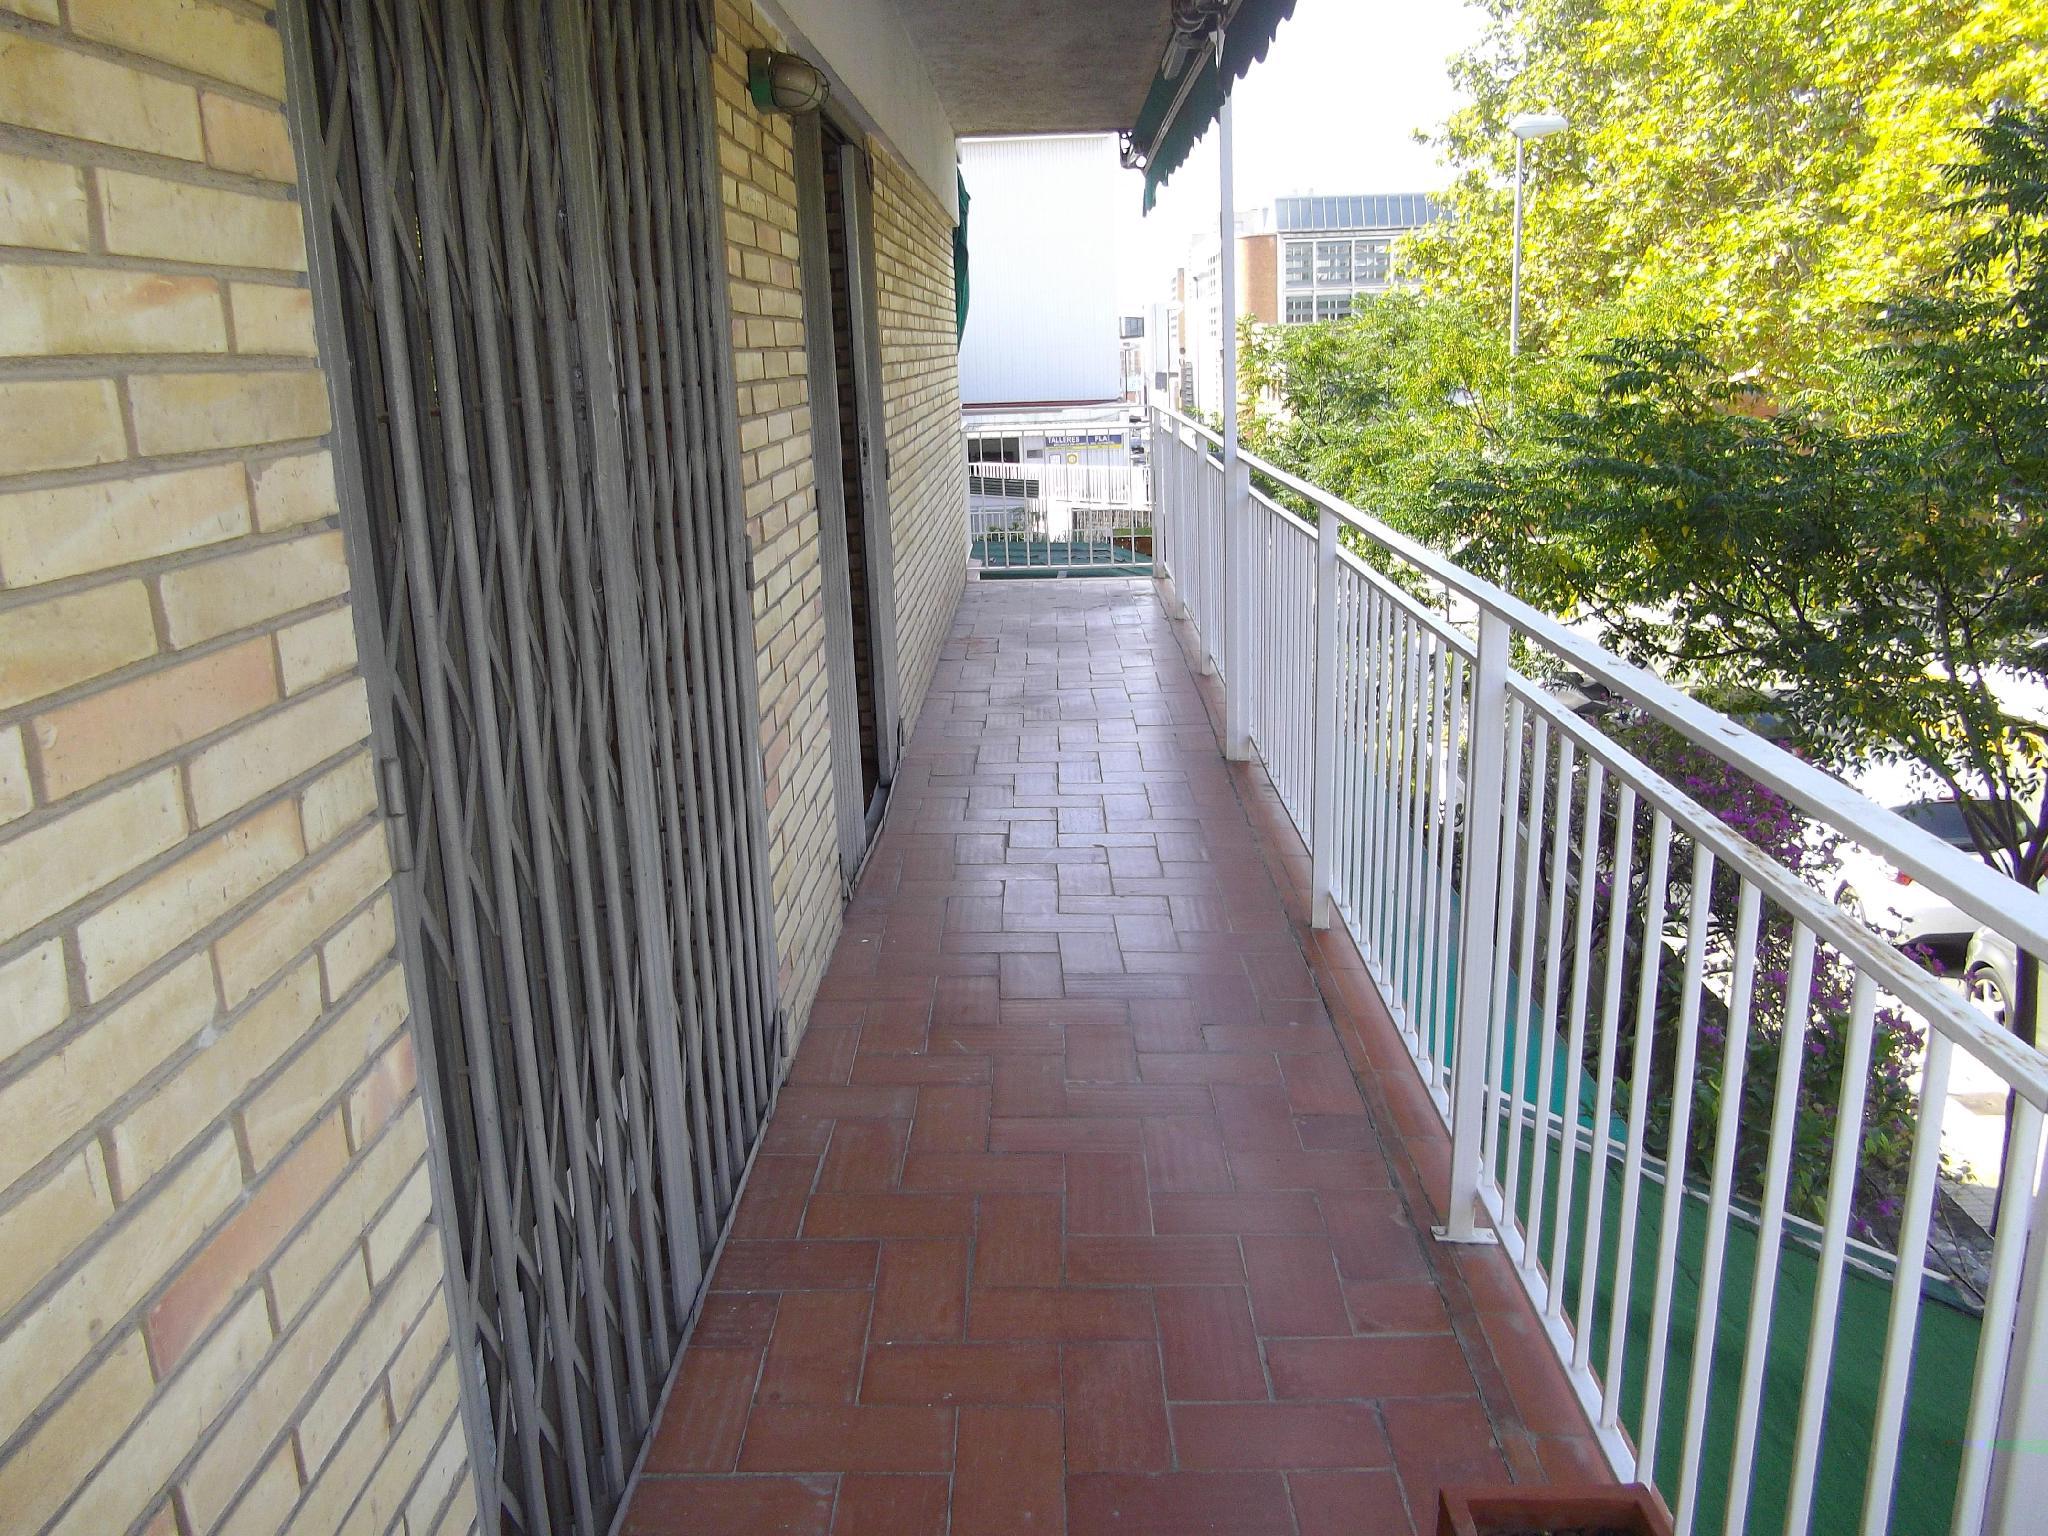 127023 - Zona El Gall, pr�ximo a Plaza Sardana